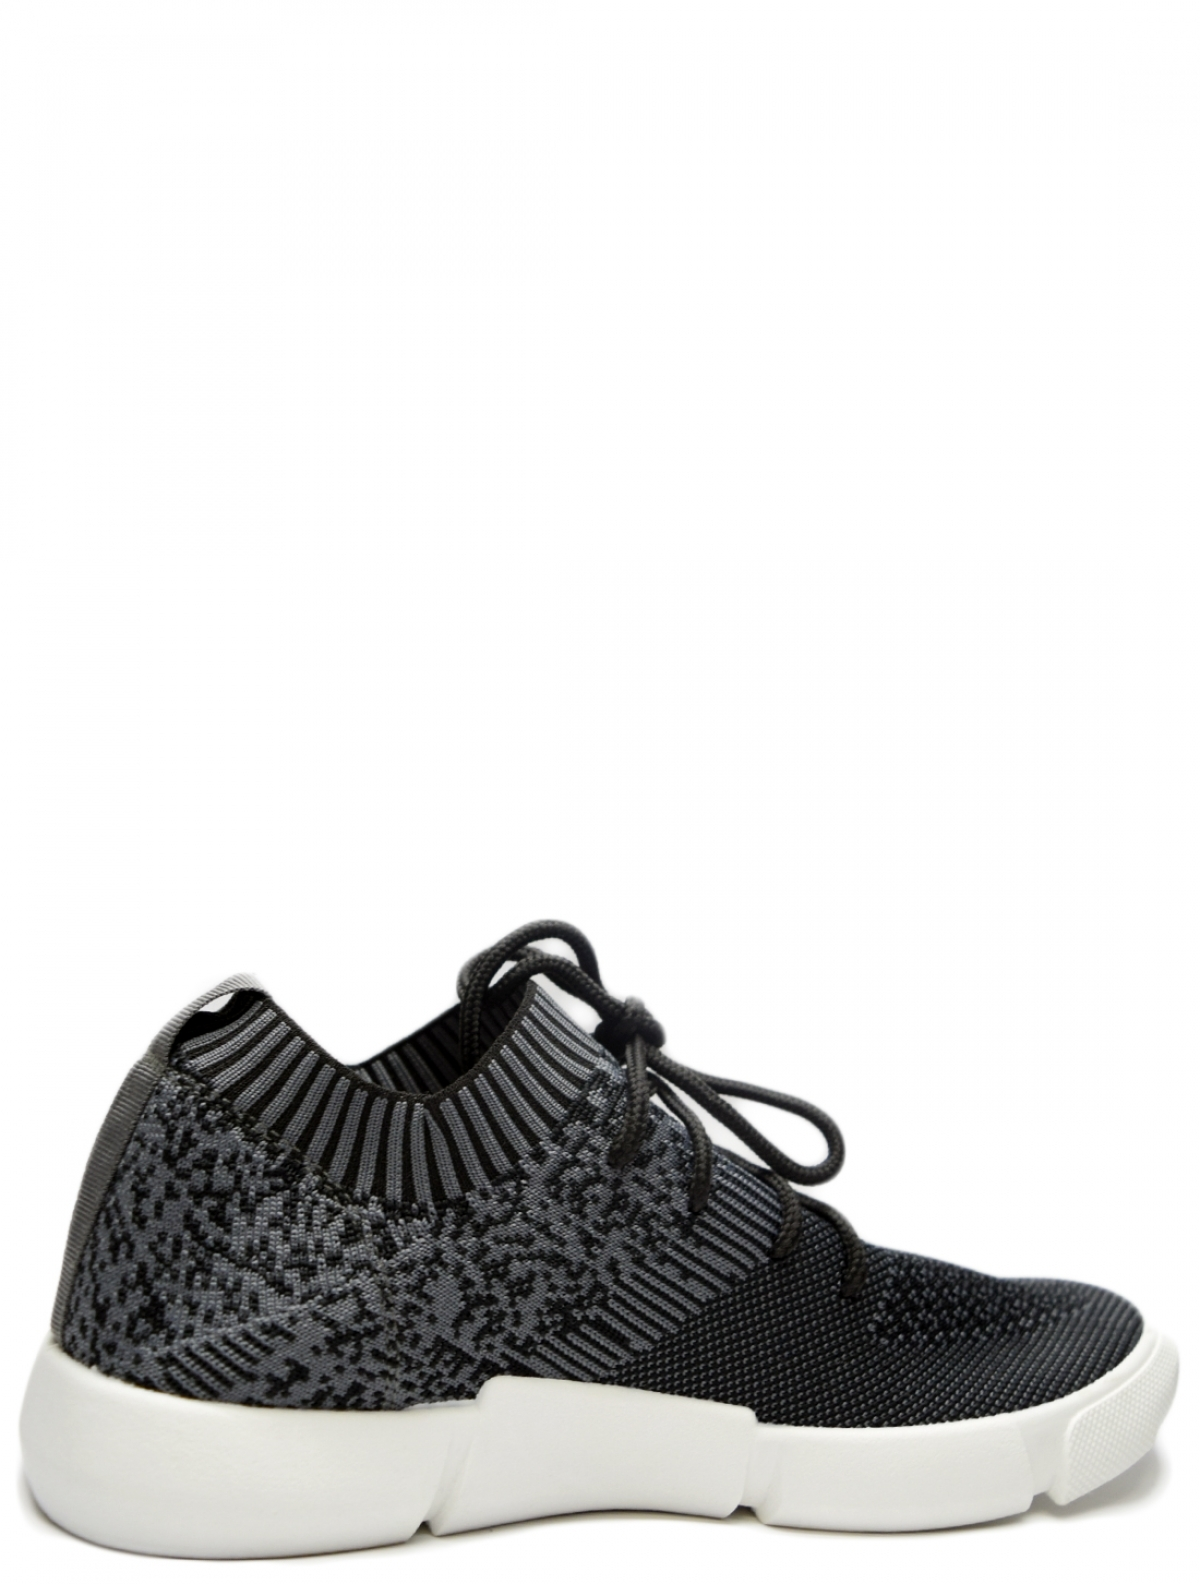 Trien SM-NH1801 мужские кроссовки